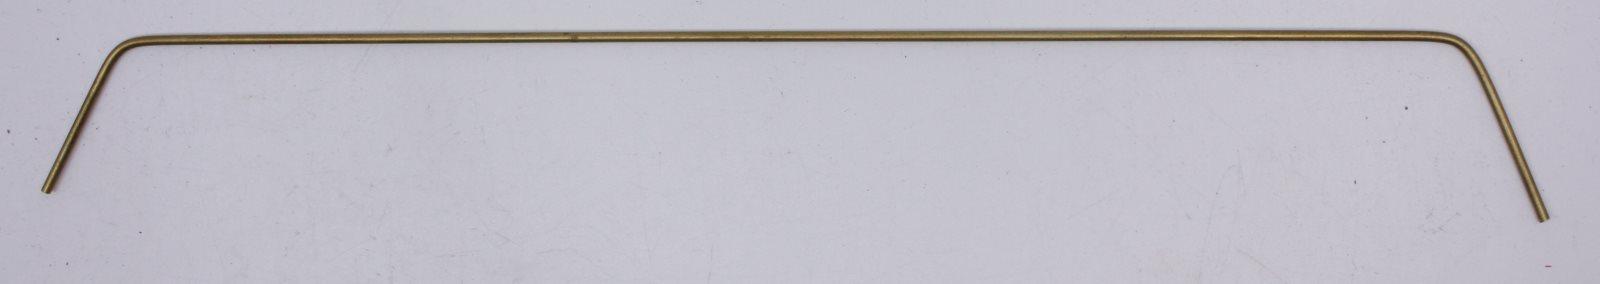 American Flyer 4000-8 Standard Gauge Long Brass Roof Rail